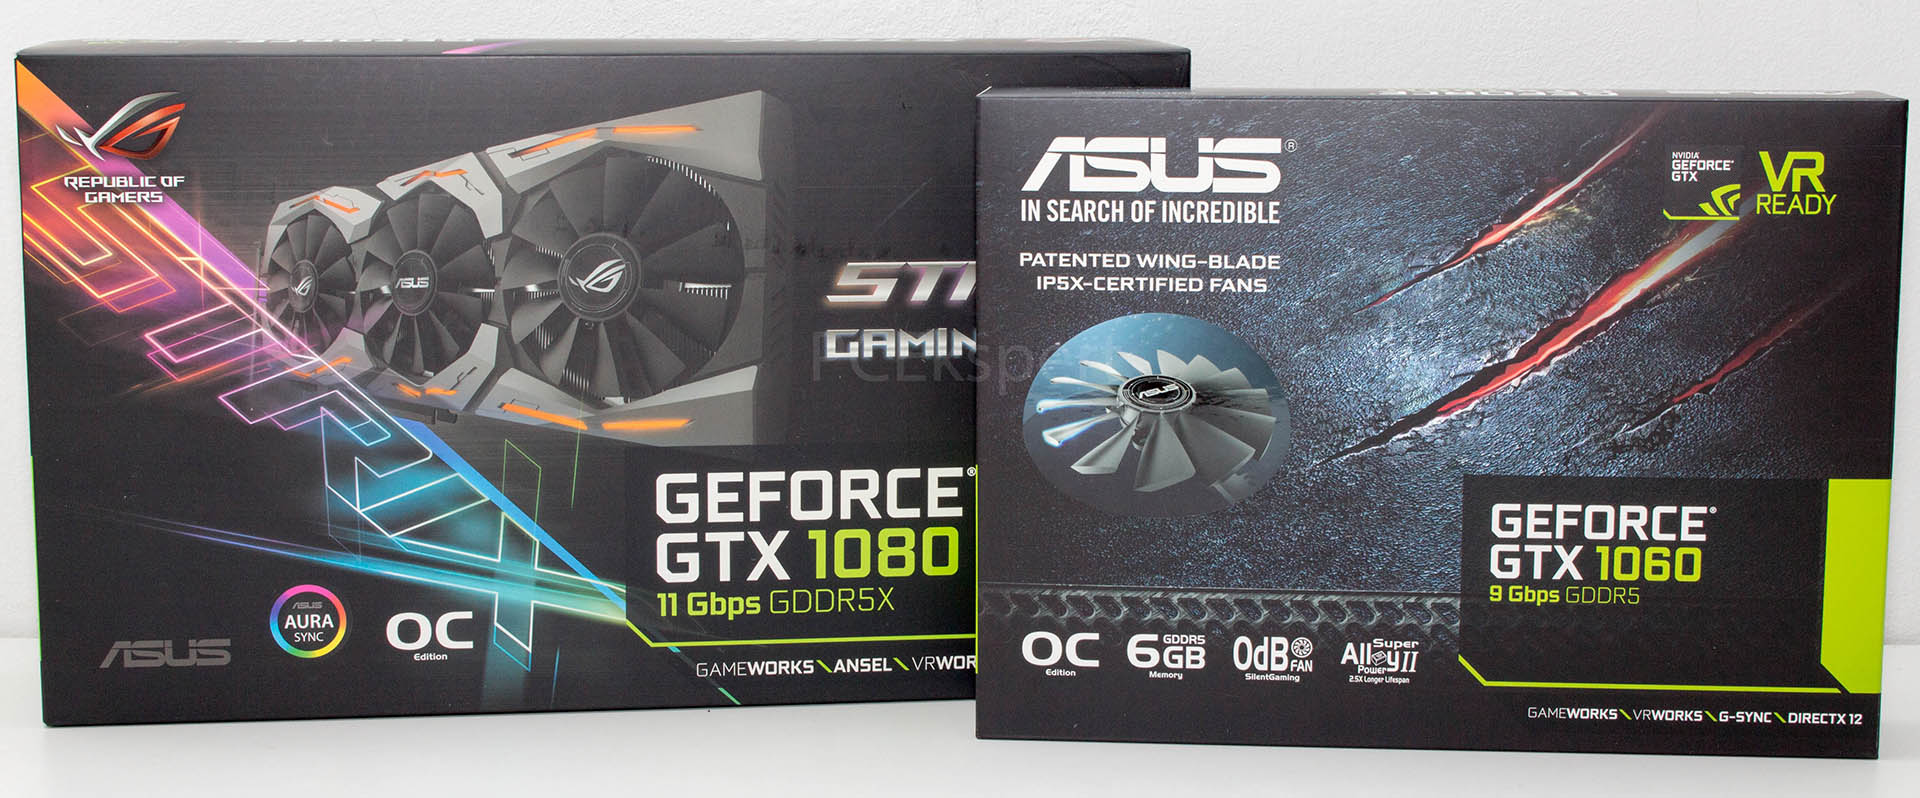 ASUS STRIX GTX1080 Gaming OC 8 GB 11 Gbps & GTX1060 6GB 9 Gbps recenzija